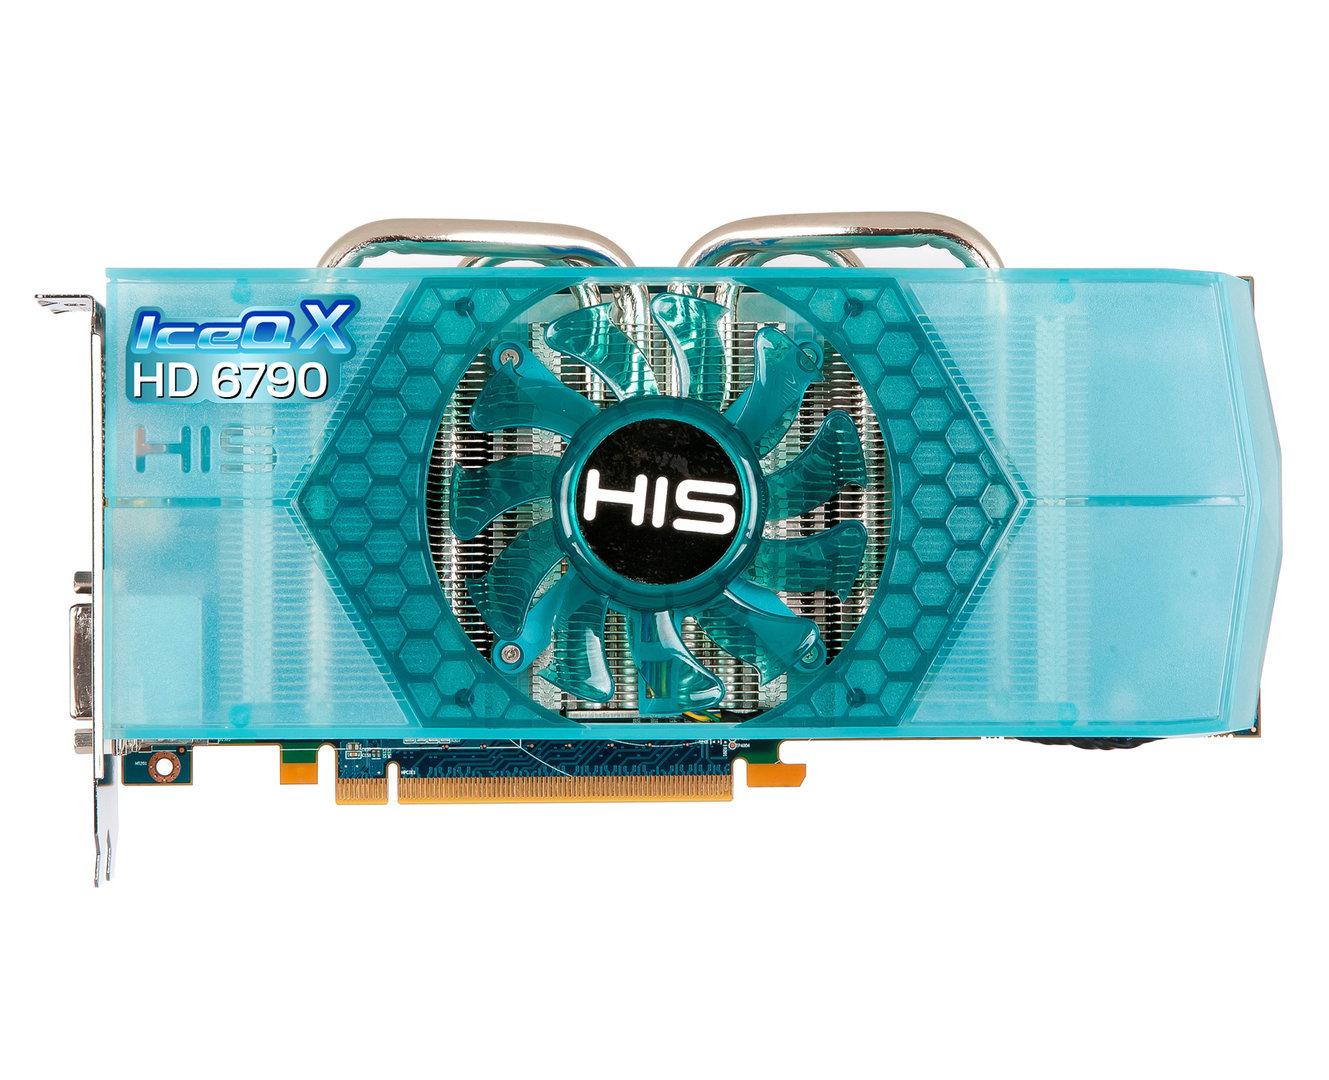 HIS 6790 IceQ X